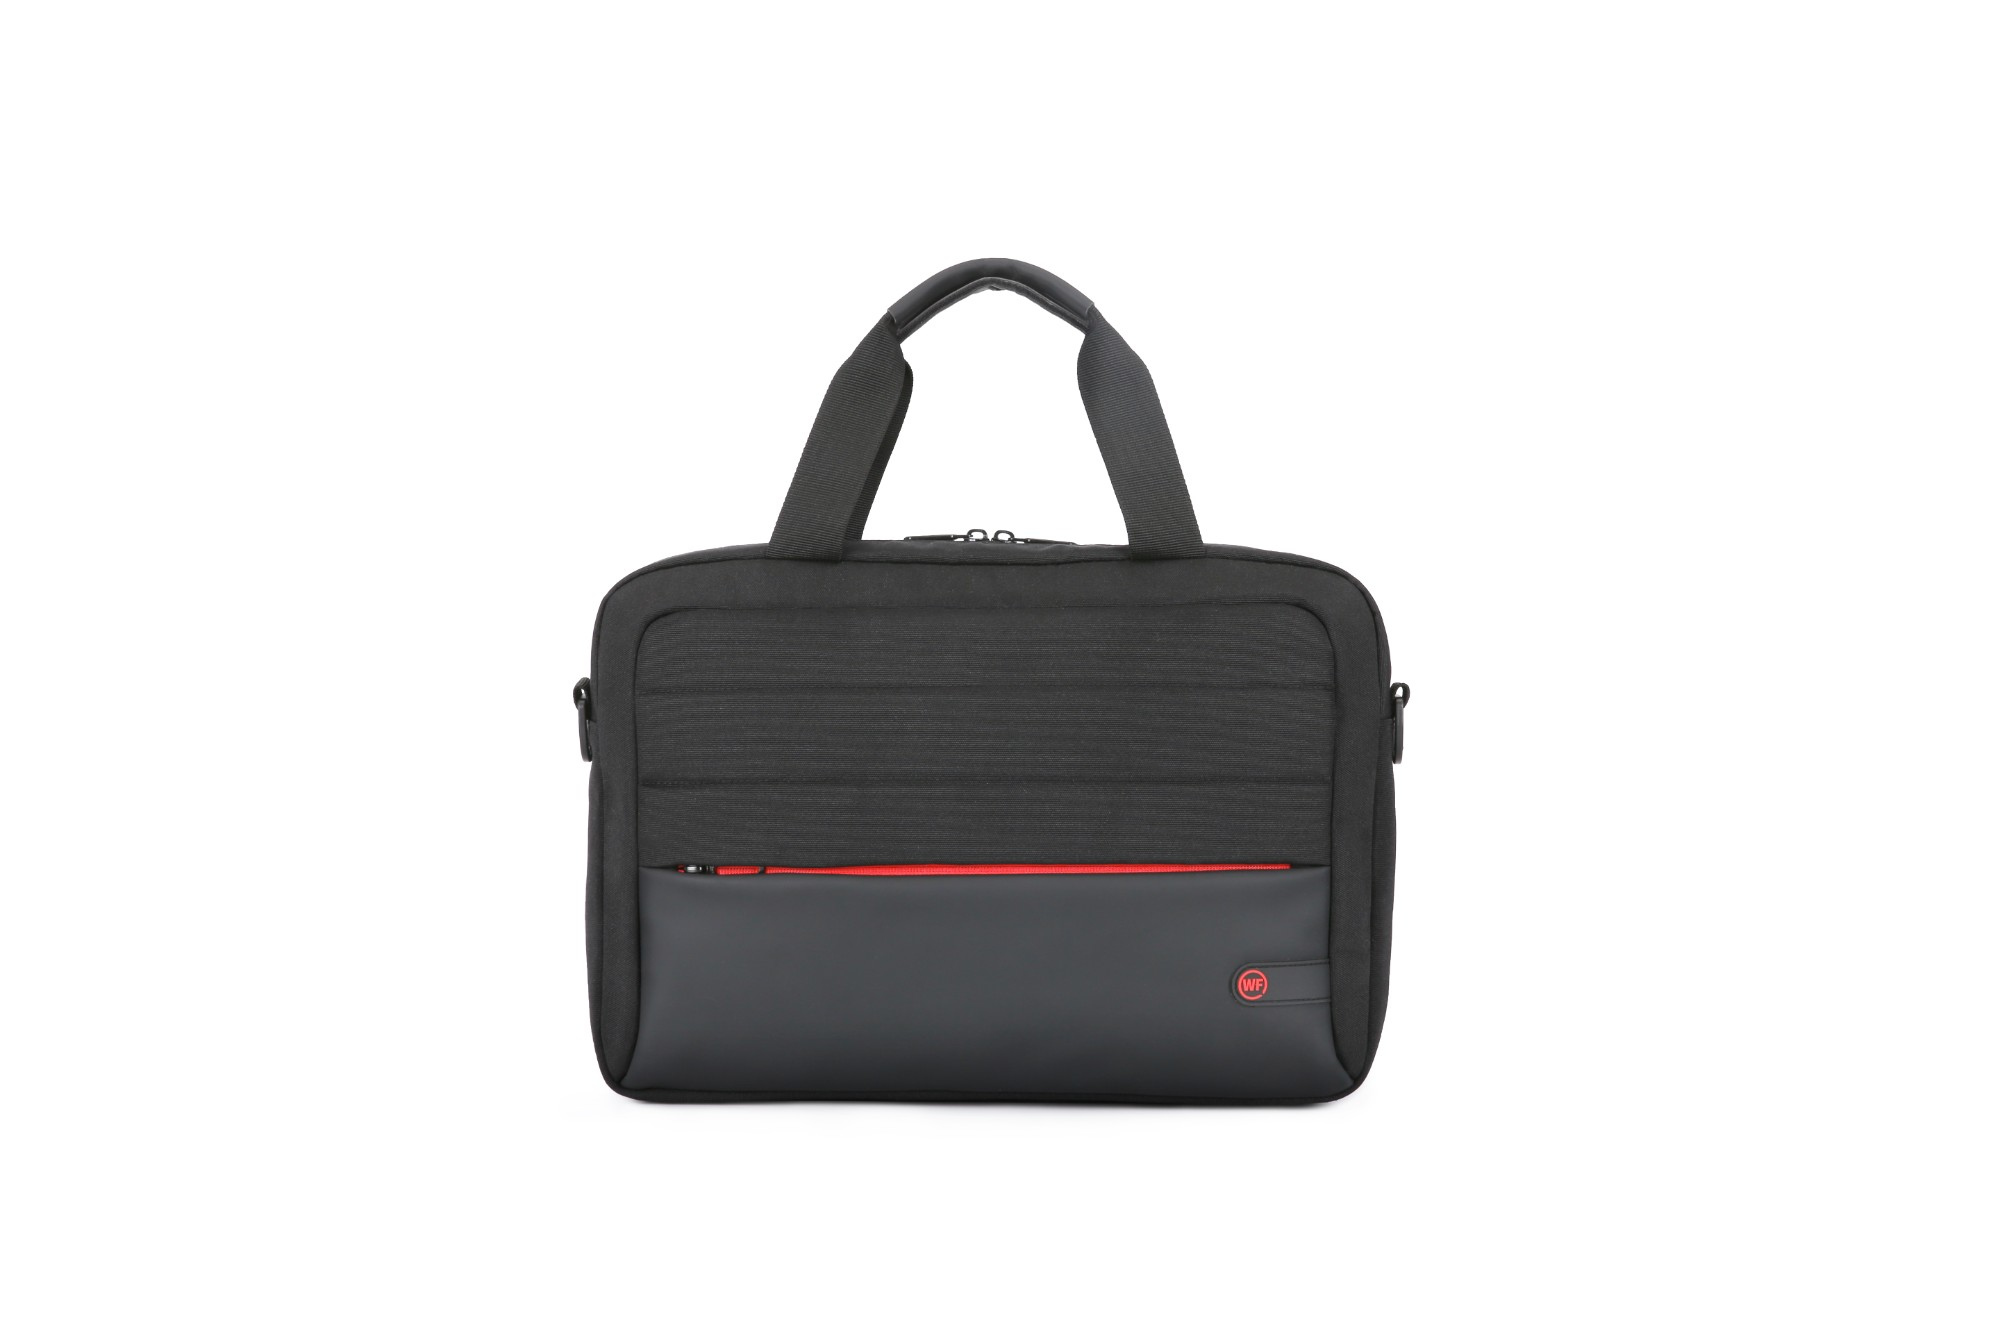 Daily Commuting Laptop Bag Manufacturers, Daily Commuting Laptop Bag Factory, Supply Daily Commuting Laptop Bag